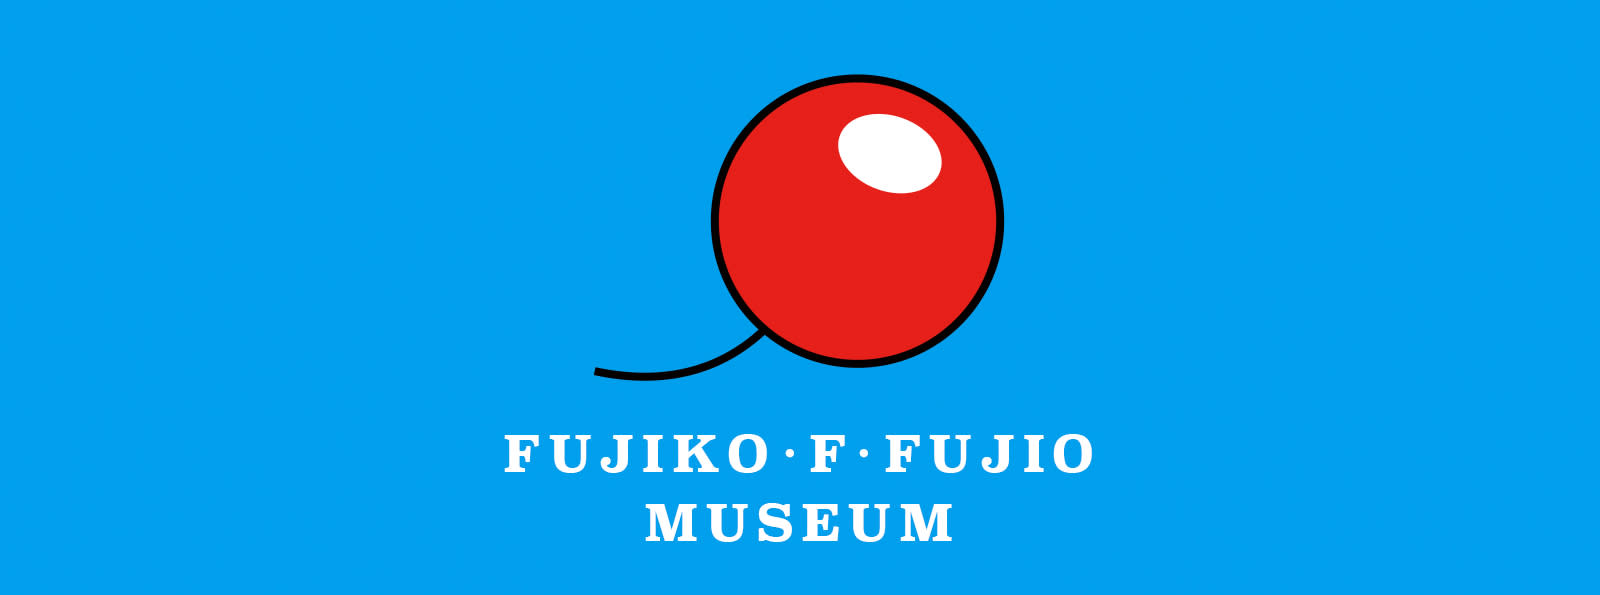 Tickets to Fujiko F Fujio Doraemon Museum Near Tokyo, Japan